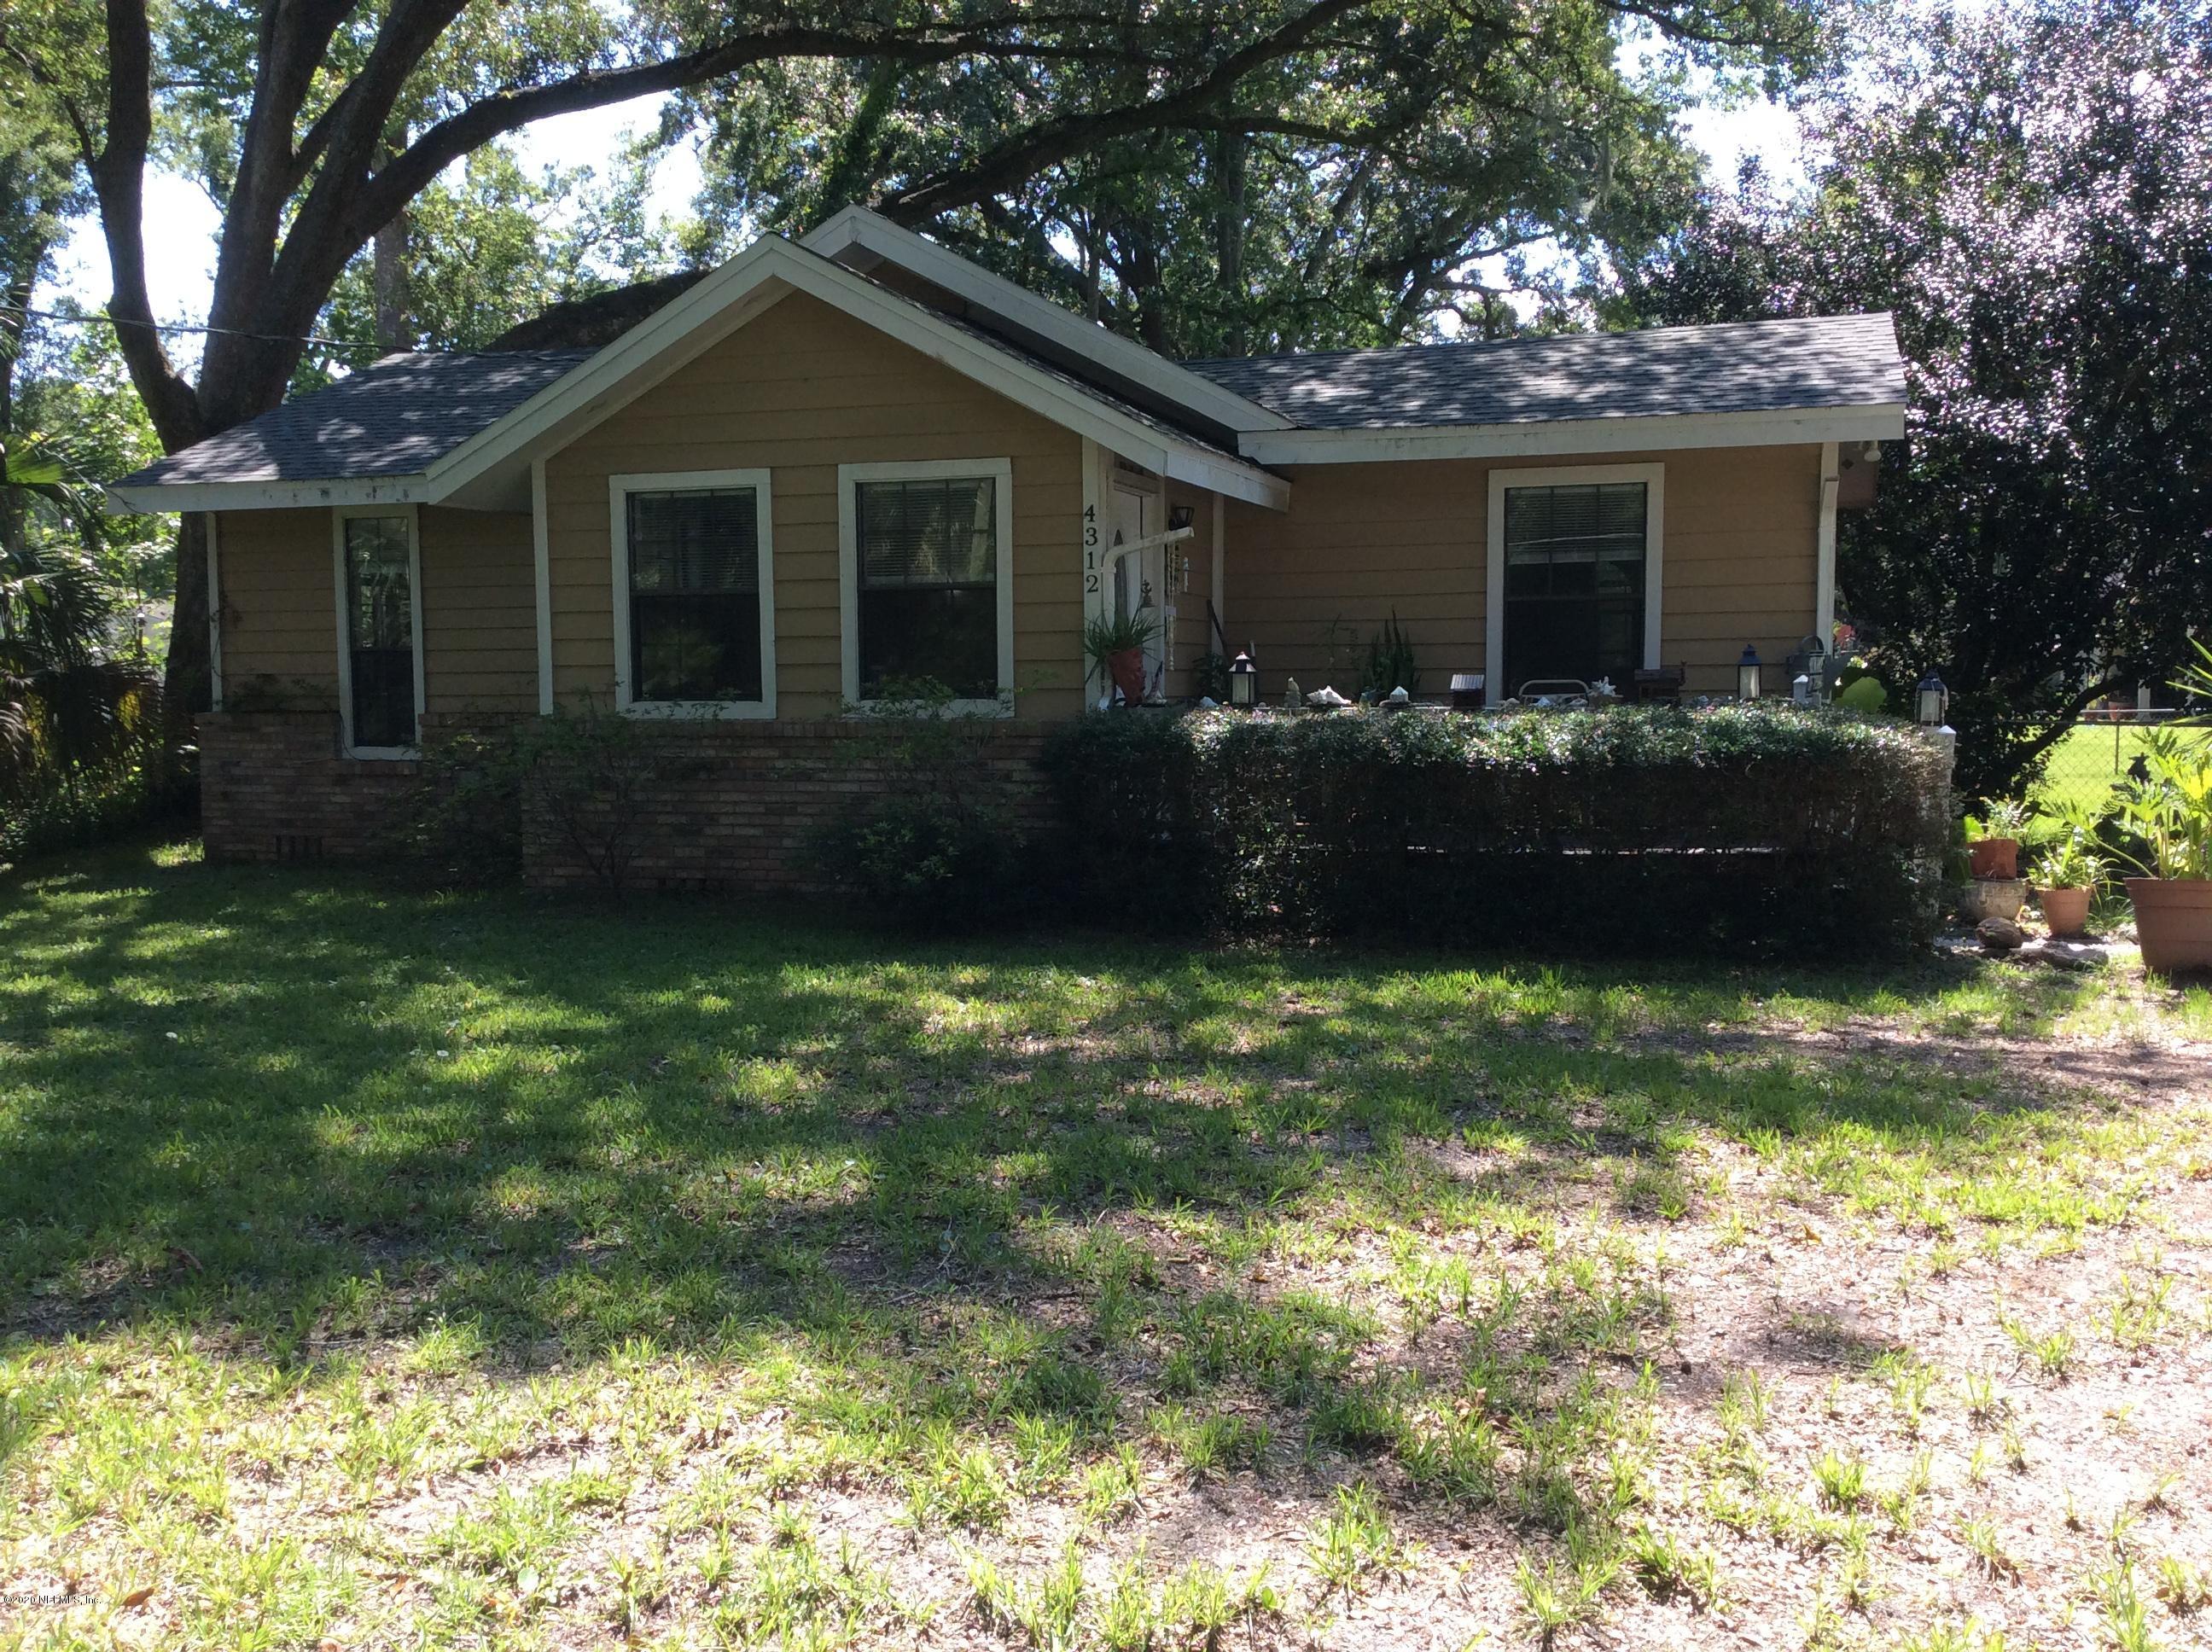 4312 HUDNALL, JACKSONVILLE, FLORIDA 32207, 2 Bedrooms Bedrooms, ,1 BathroomBathrooms,Residential,For sale,HUDNALL,1058772